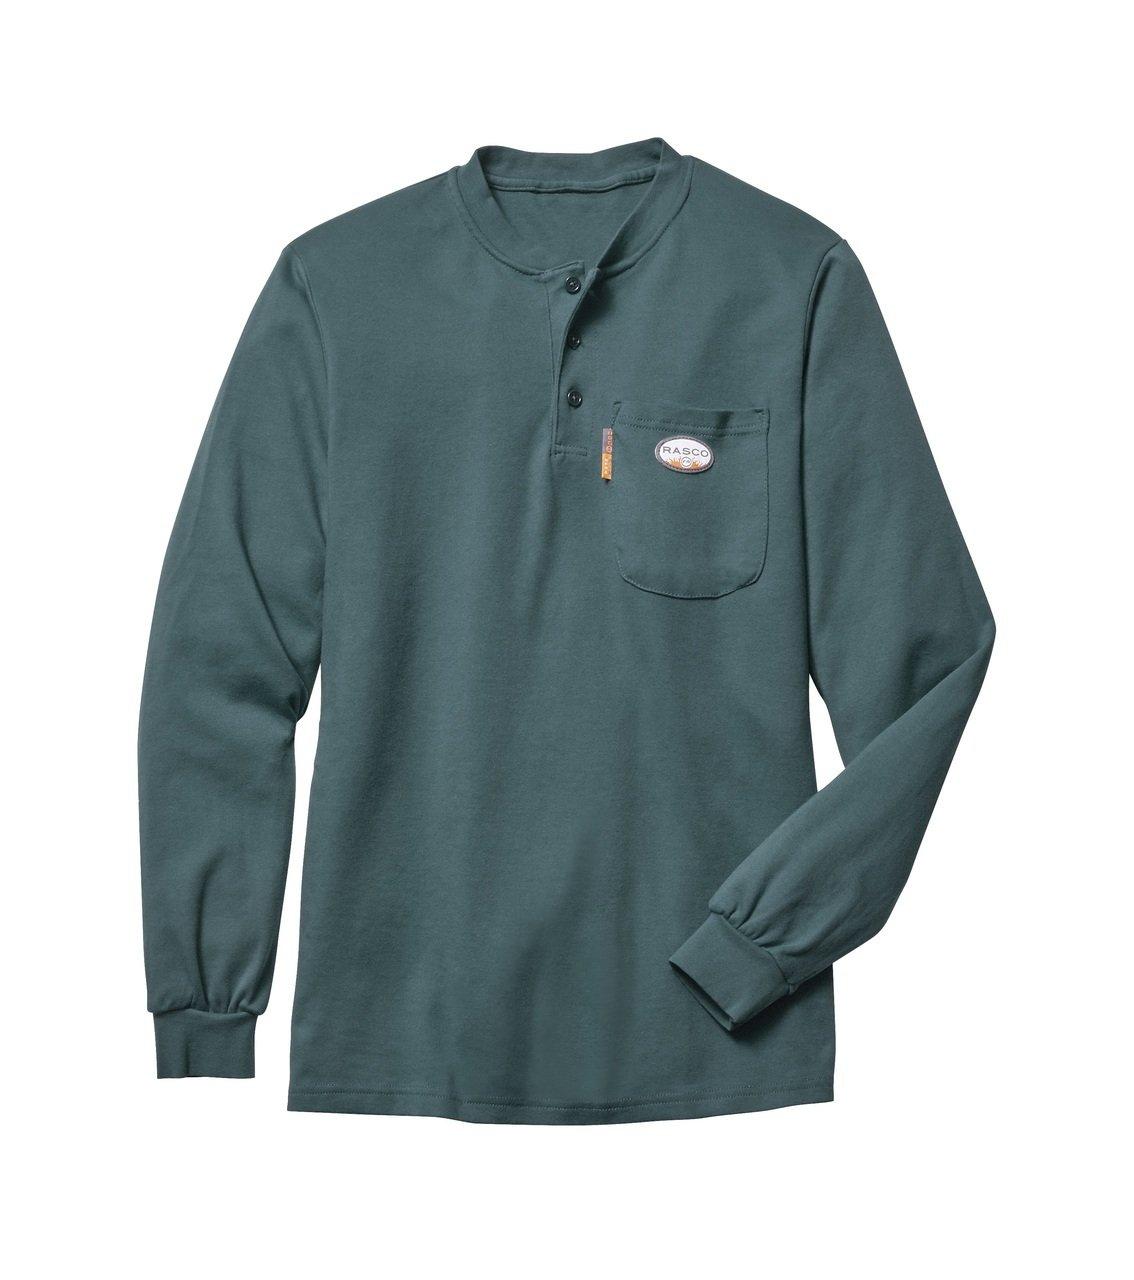 RASCO Men's Camo Fr Henley T-Shirt - Cmf458 NTF453